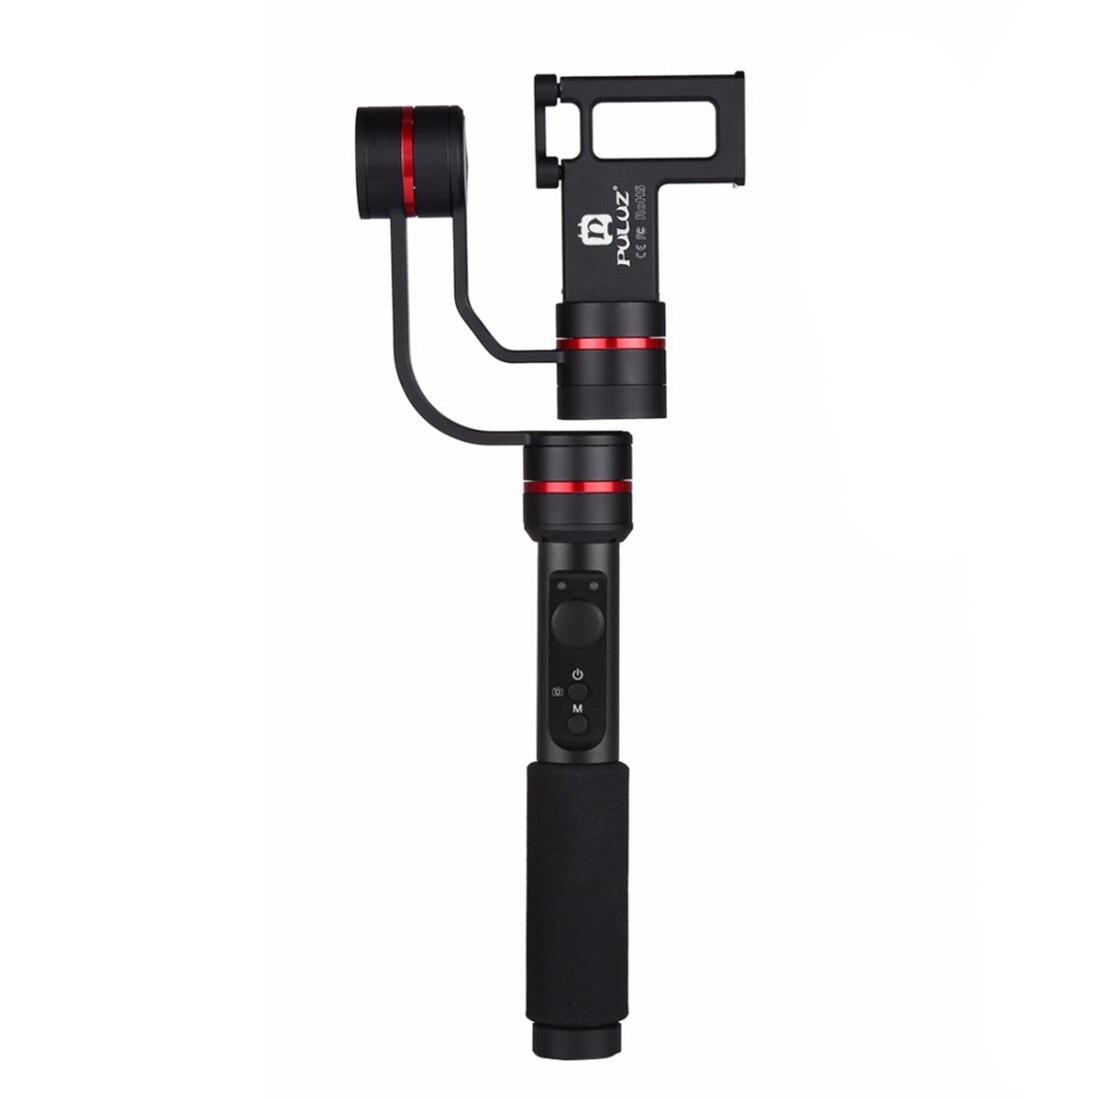 PULUZ G1 3 eje Handheld Selfie teléfono Gimbal Steadicam estabilizador abrazadera de montaje para 4,7-5,5 pulgadas Smartphones, 360 grados teléfono gi